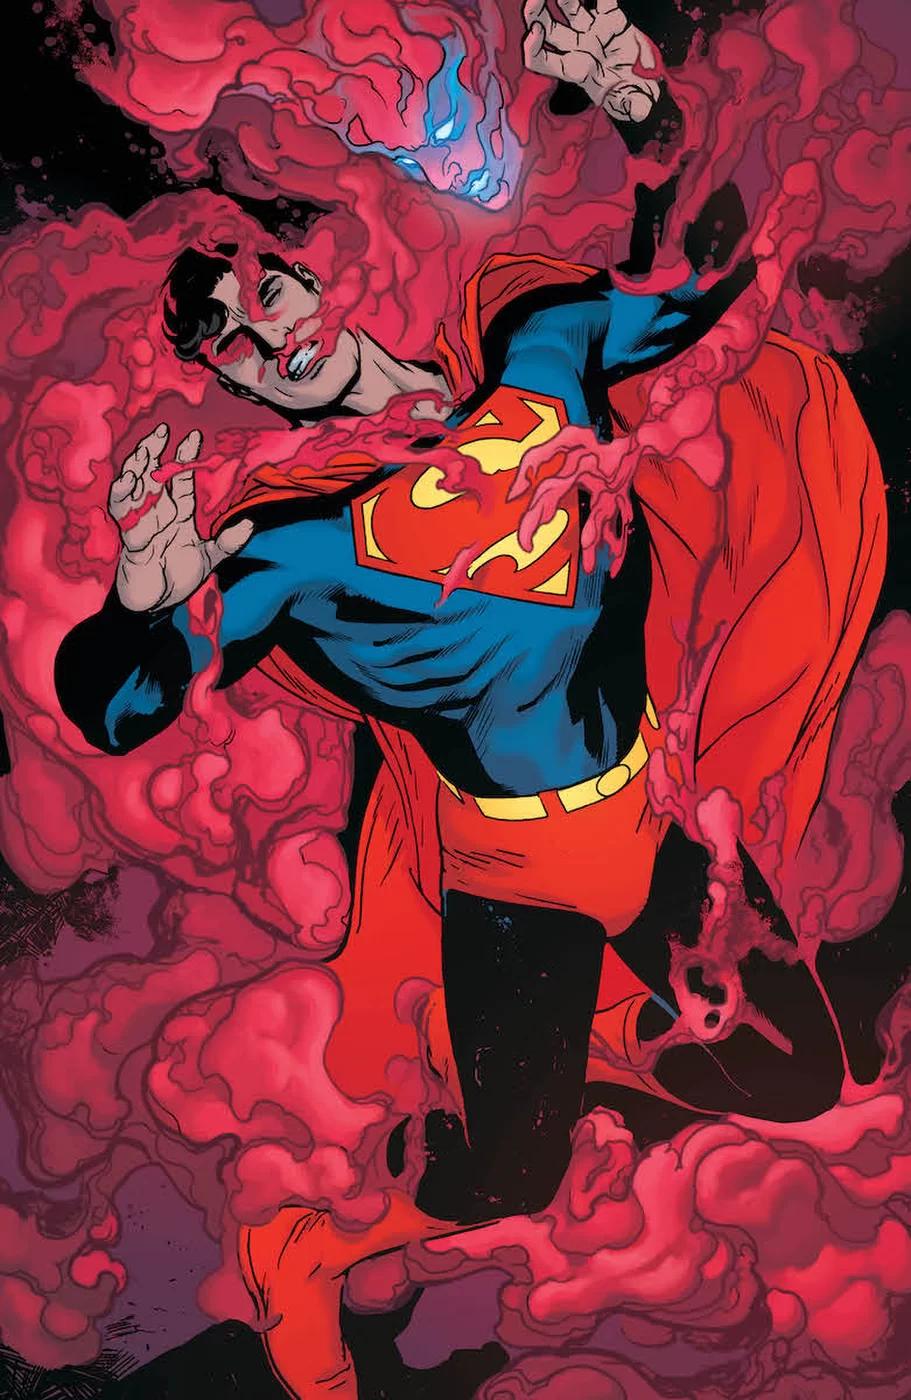 Action Comics #1005, anteprima 02